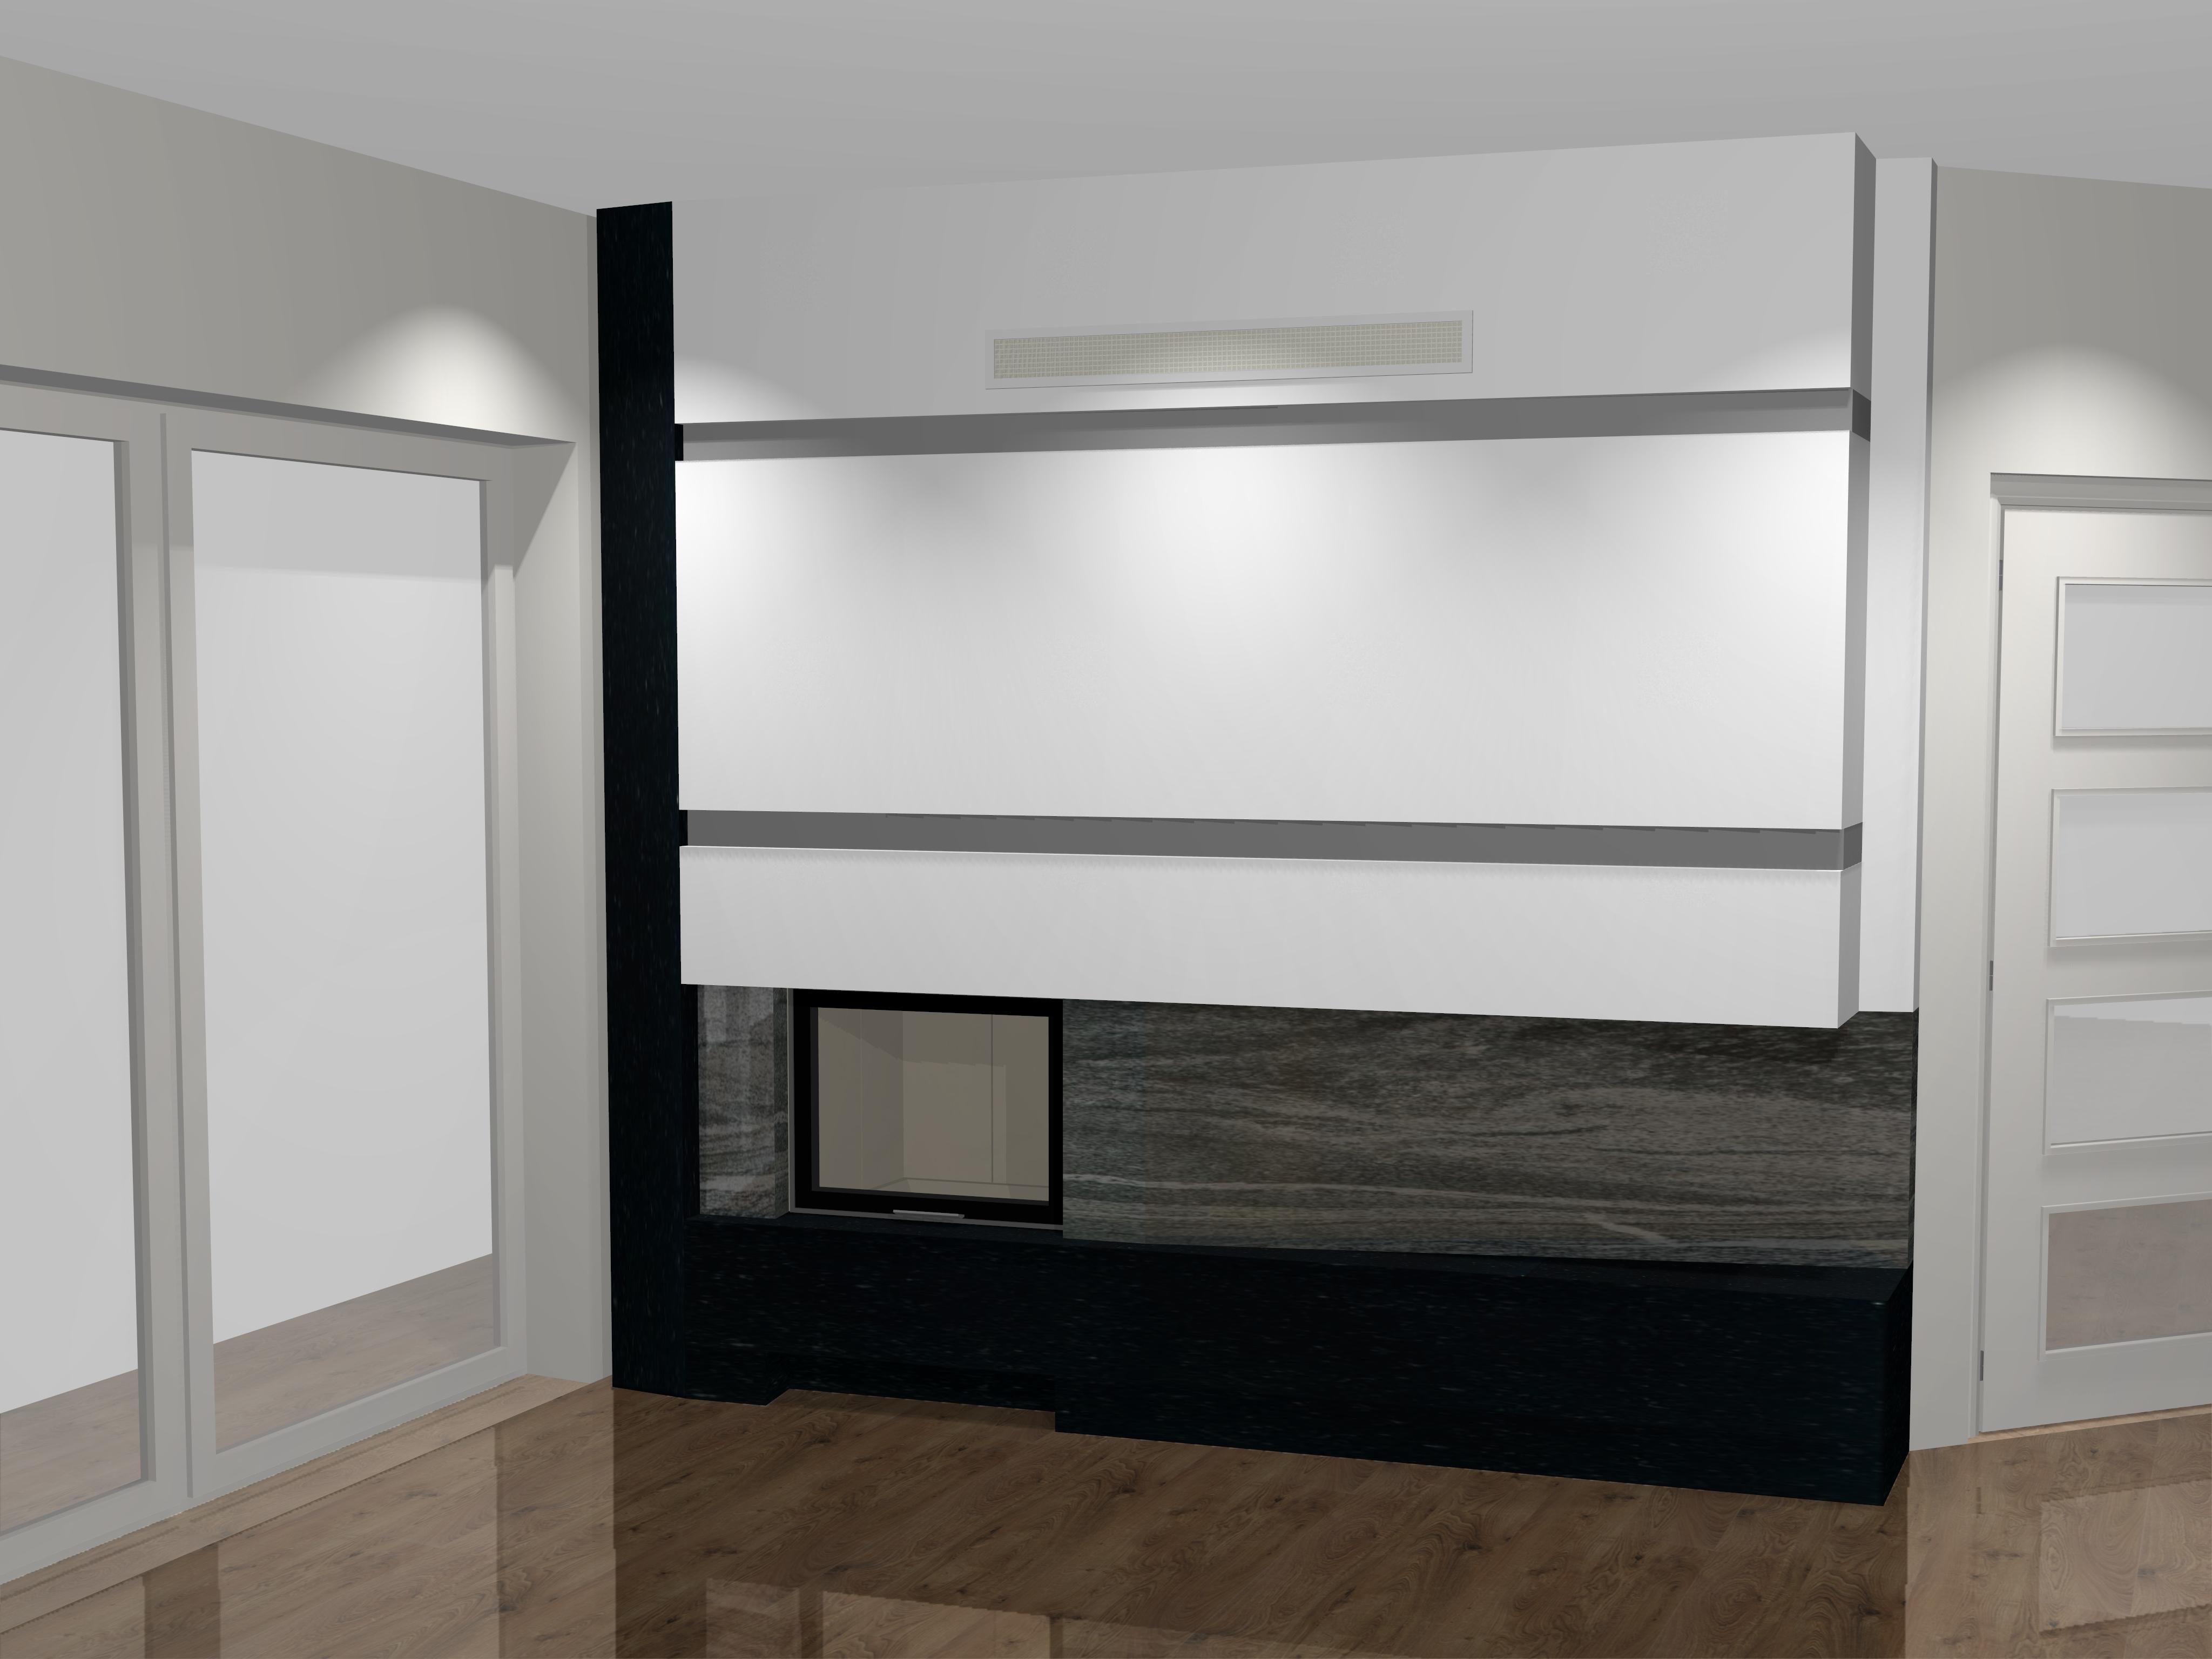 moderner kamin c 16 1 mit spartherm mit montage www. Black Bedroom Furniture Sets. Home Design Ideas